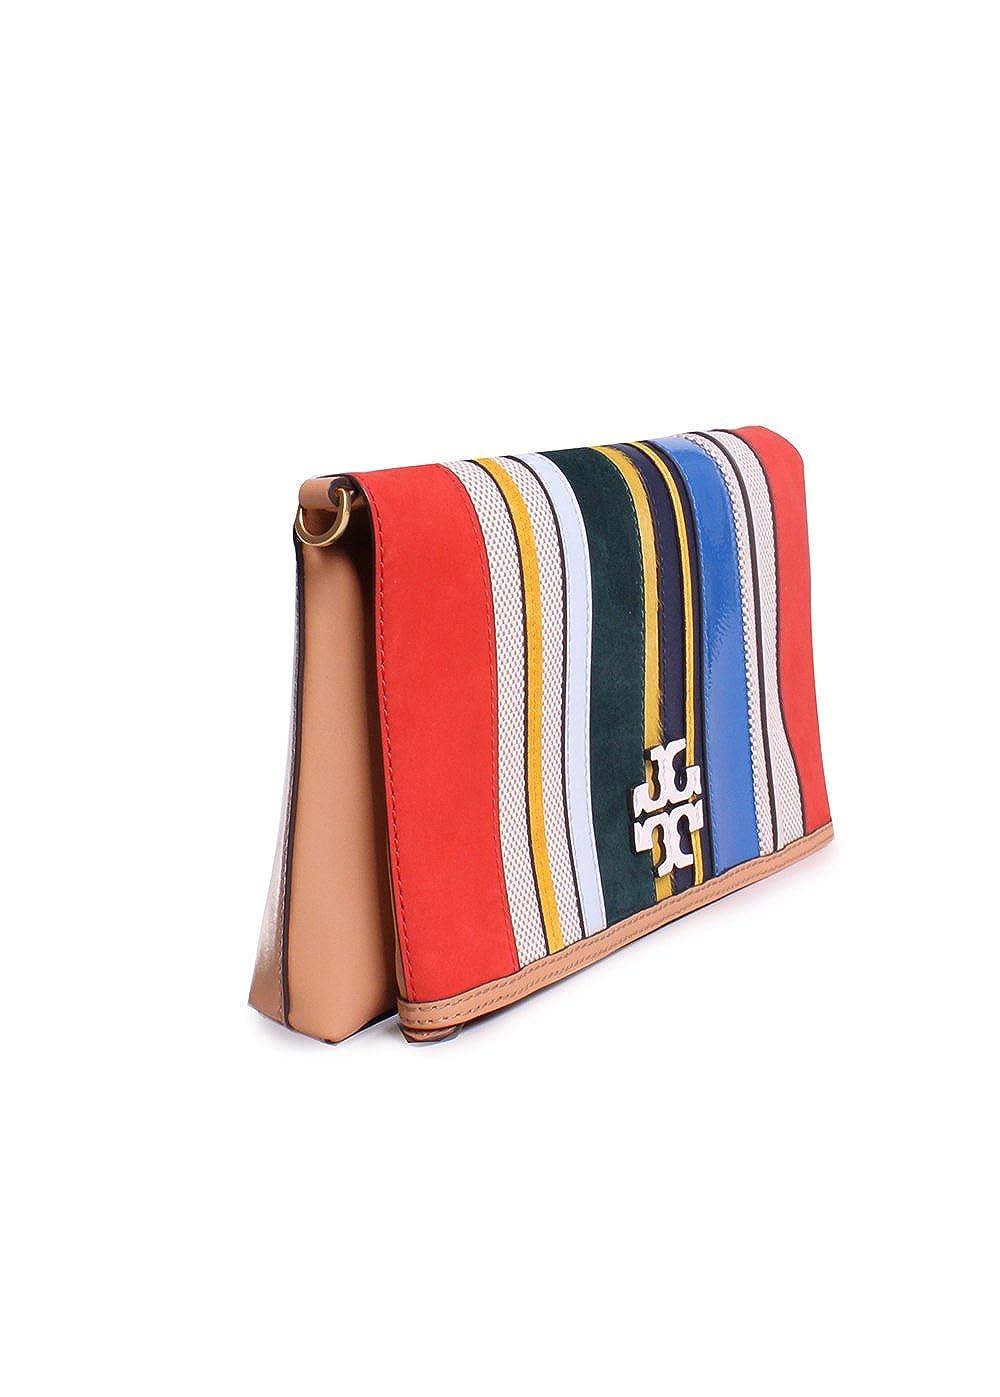 76f58d8fdeb3 Amazon.com  Tory Burch McGraw Stripe Leather Foldover Crossbody Handbag in  Balloon Stripe  Clothing